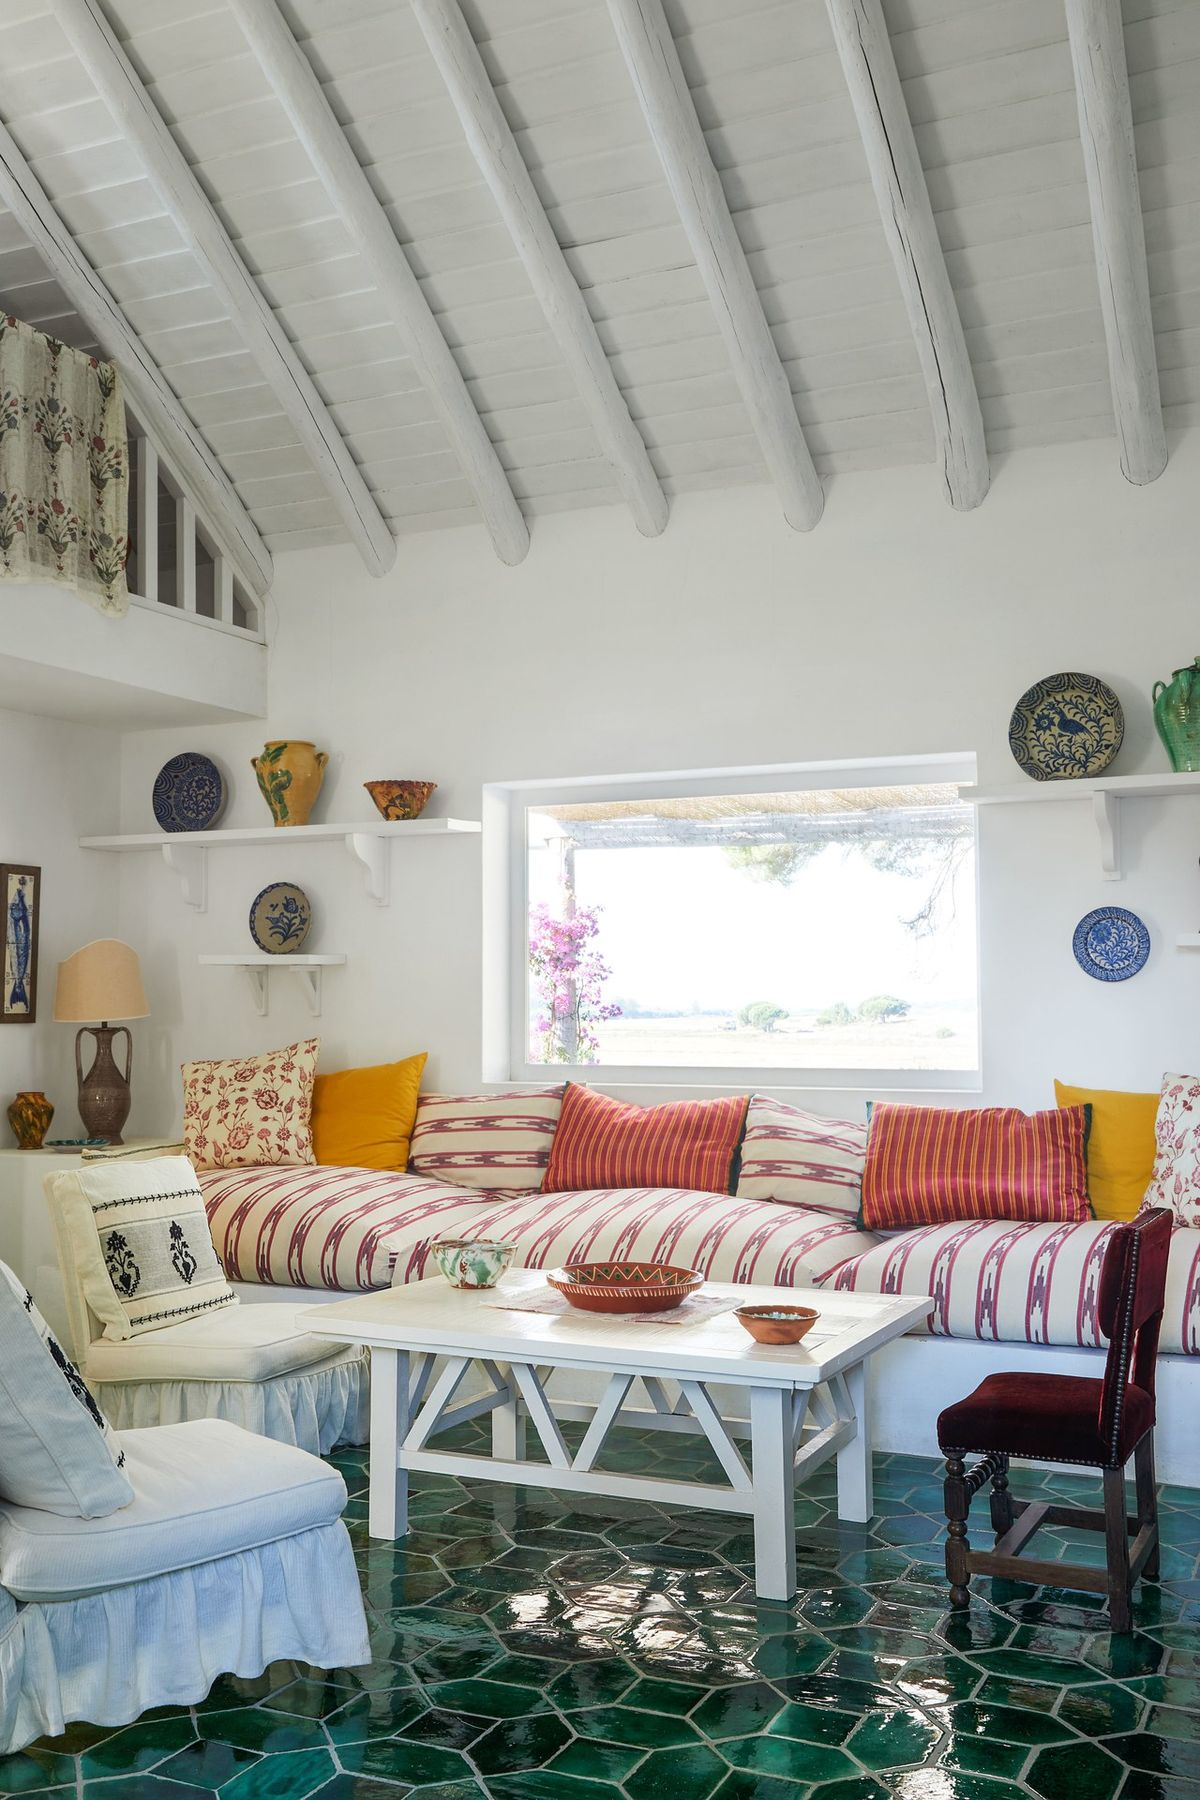 Carolina Irving Crafts a Romantic Retreat in Remote Portugal   Architectural Digest